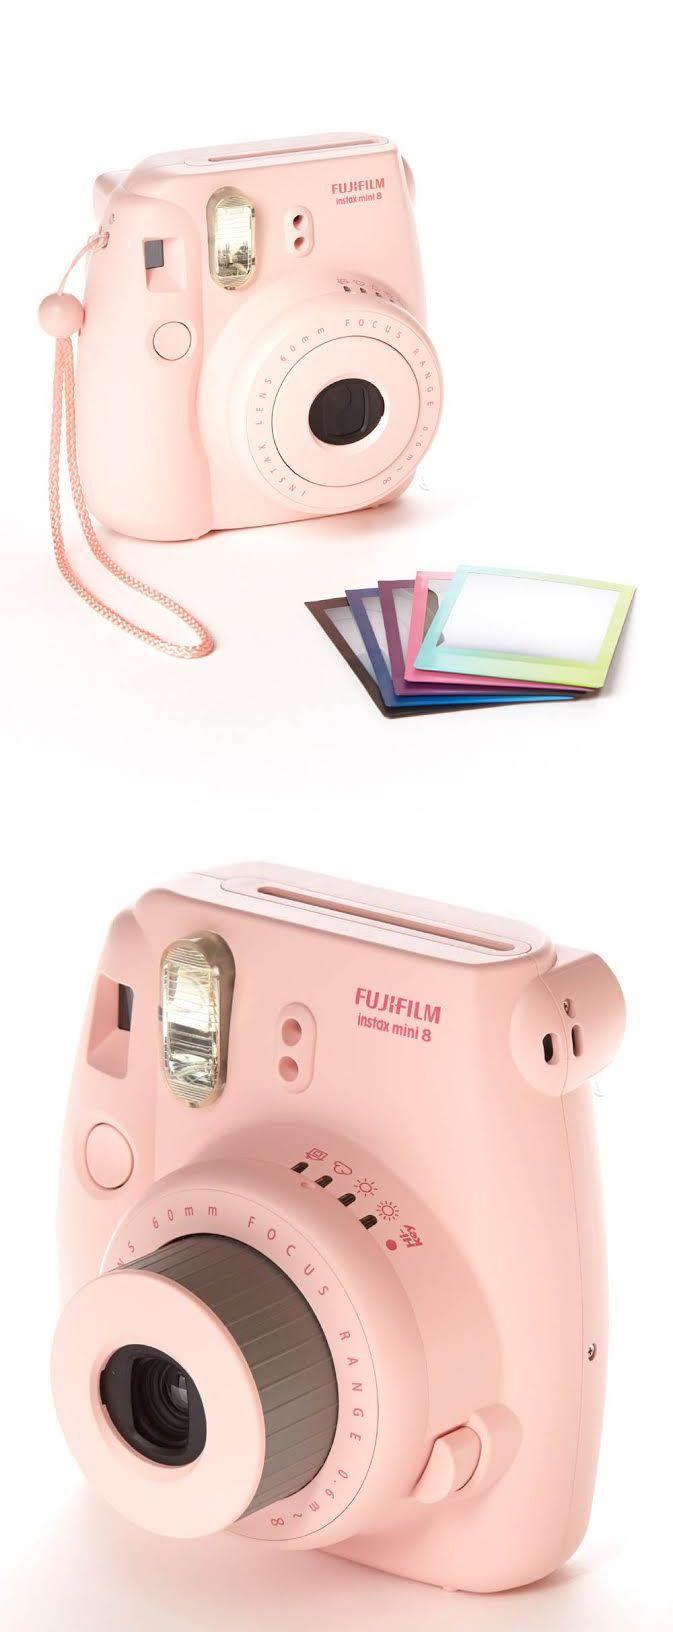 Fujiflim instax mini 8 camera polaroid film set so fun to have instant photos cute image borders too